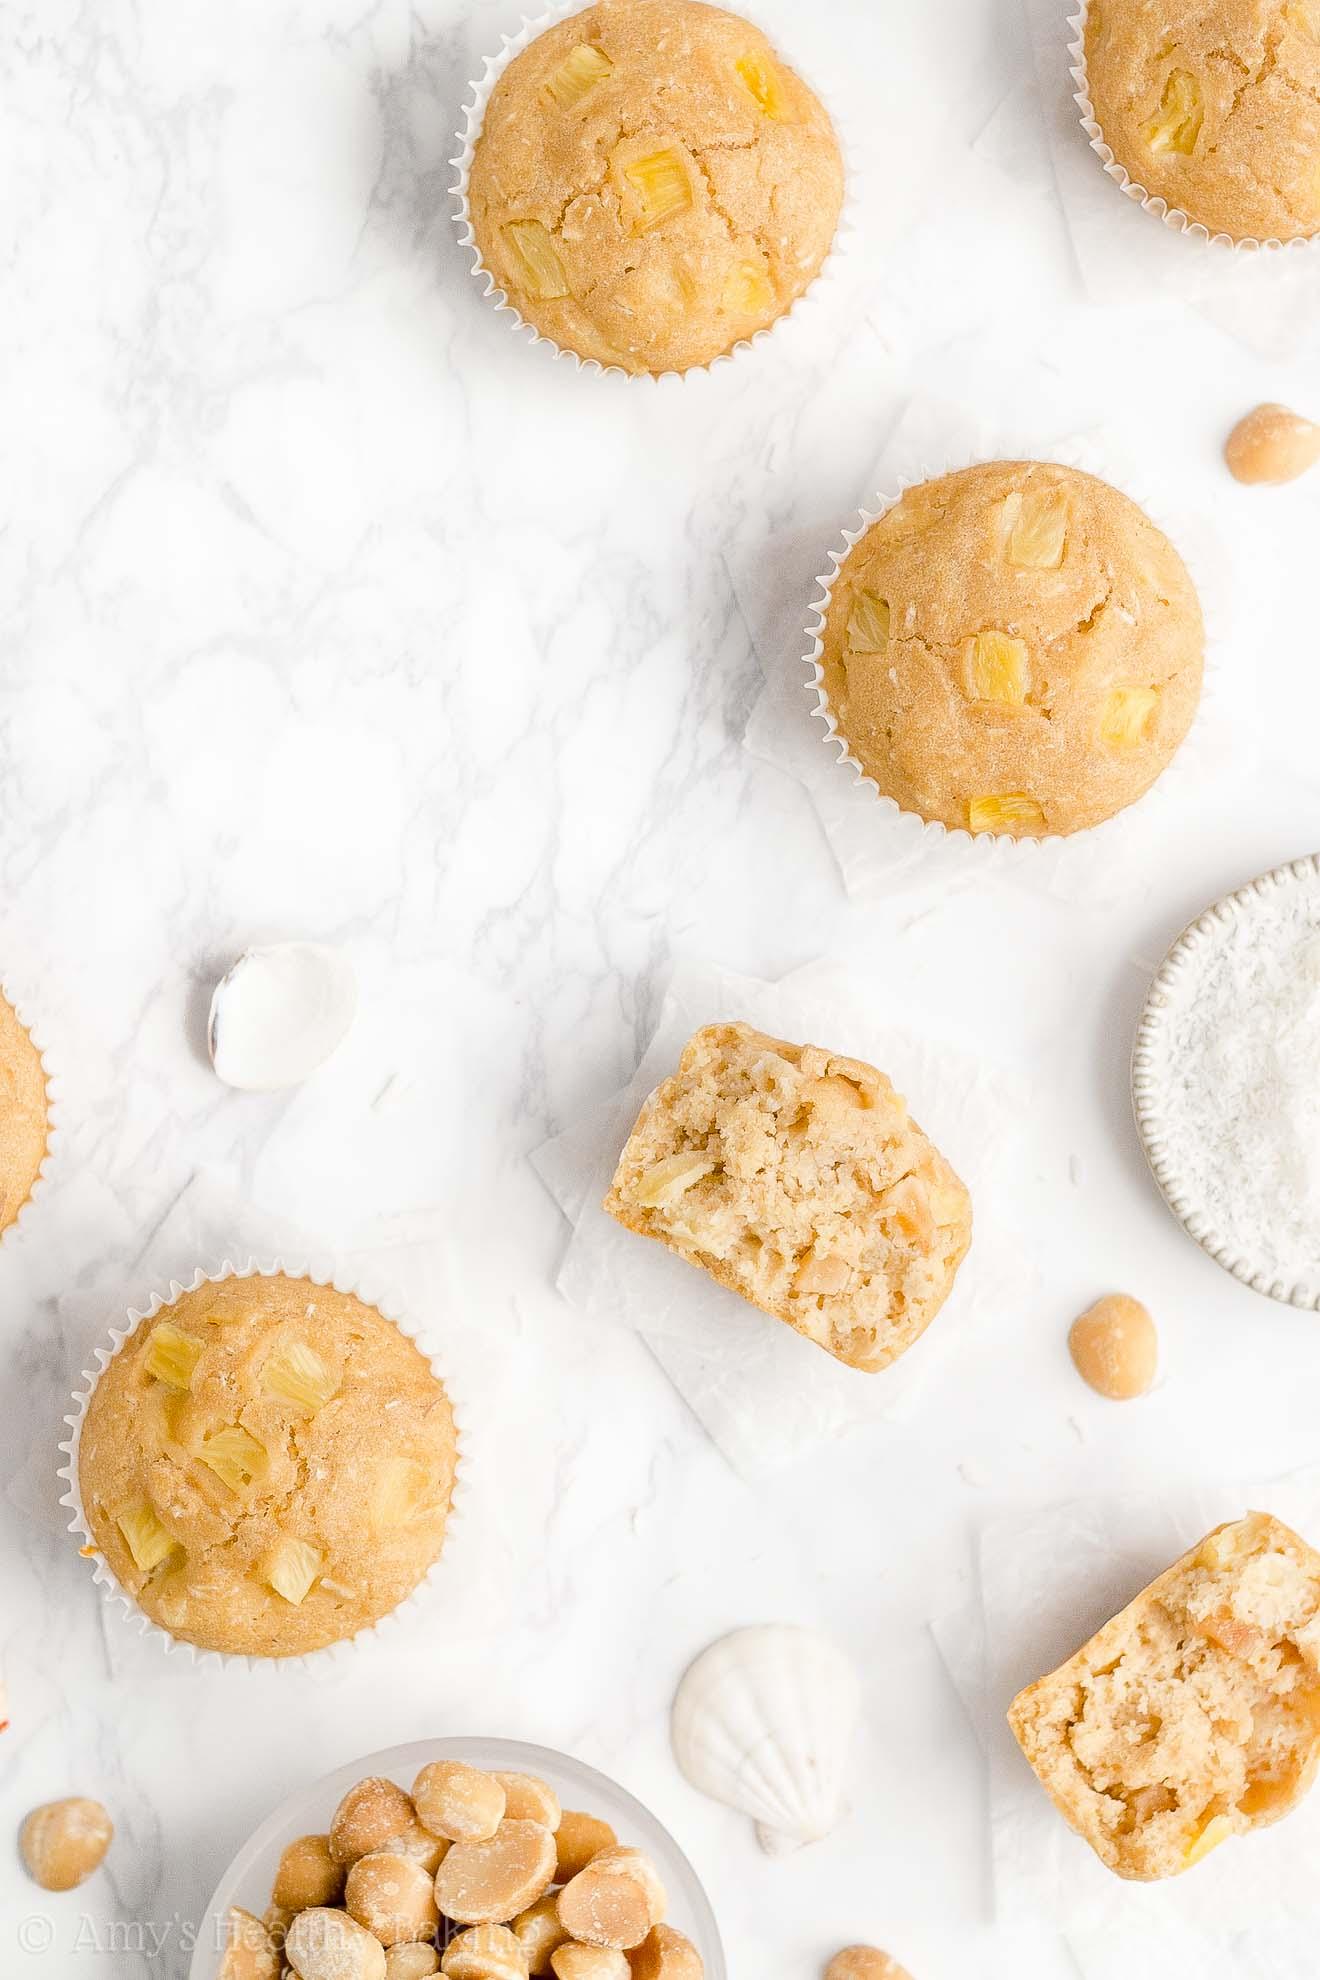 Moist Healthy Weight Watchers Pineapple, Coconut & Macadamia Nut Muffins